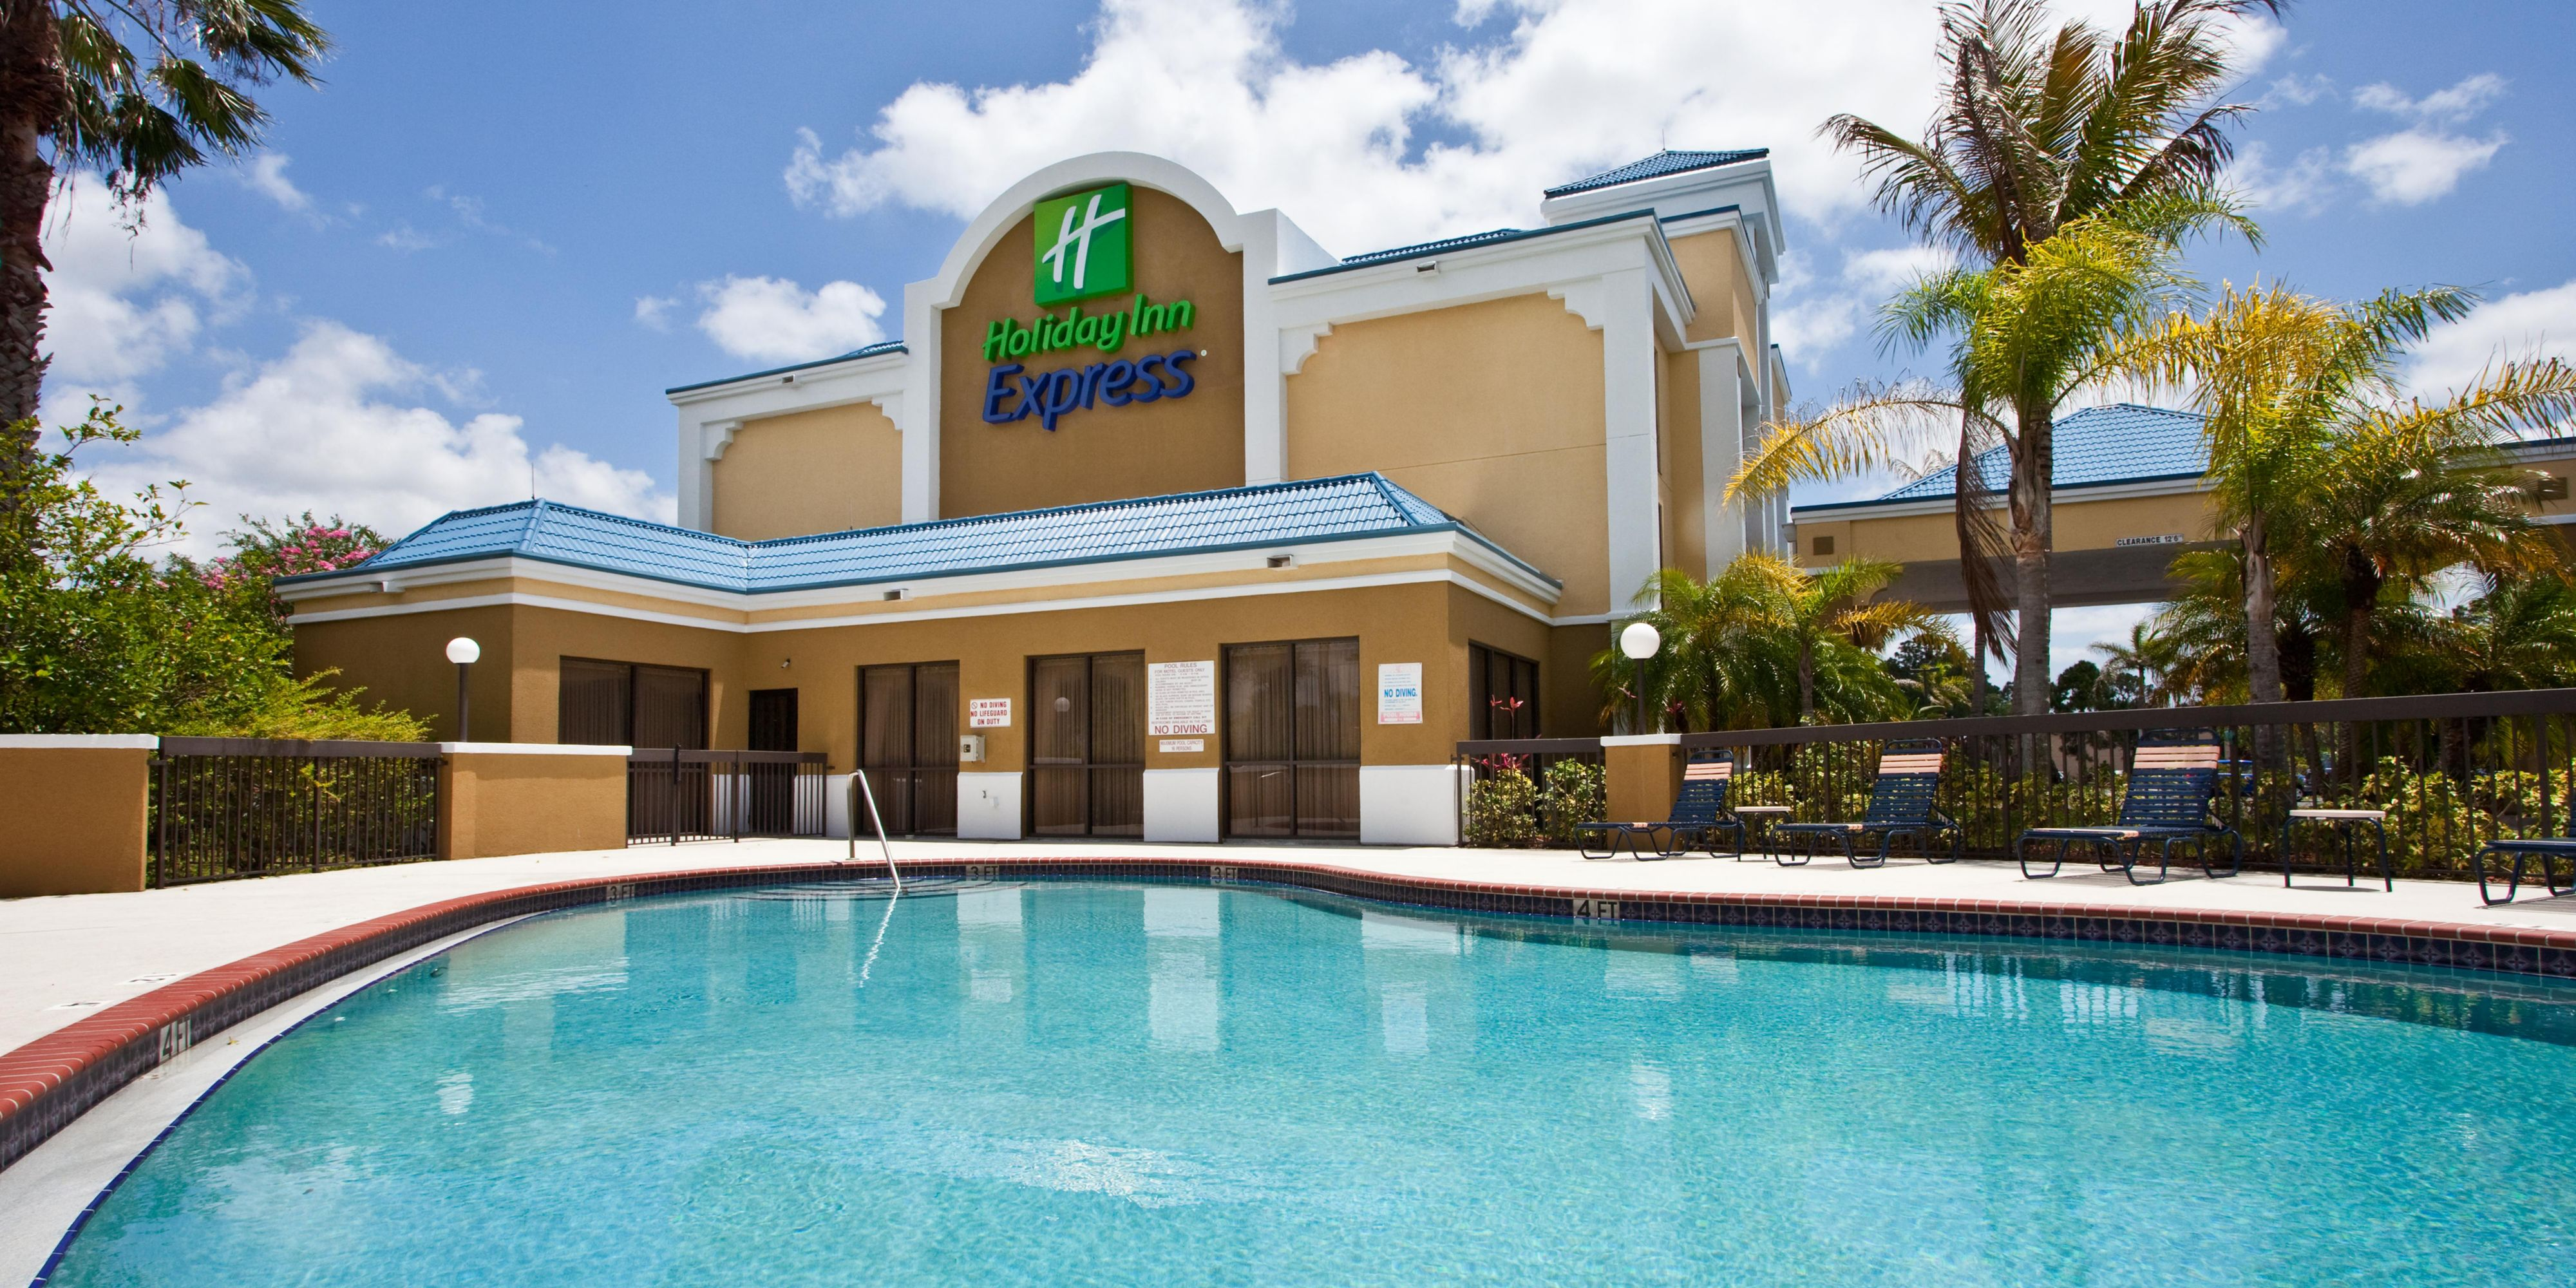 Holiday Inn Express Vero Beach 4330420853 2x1